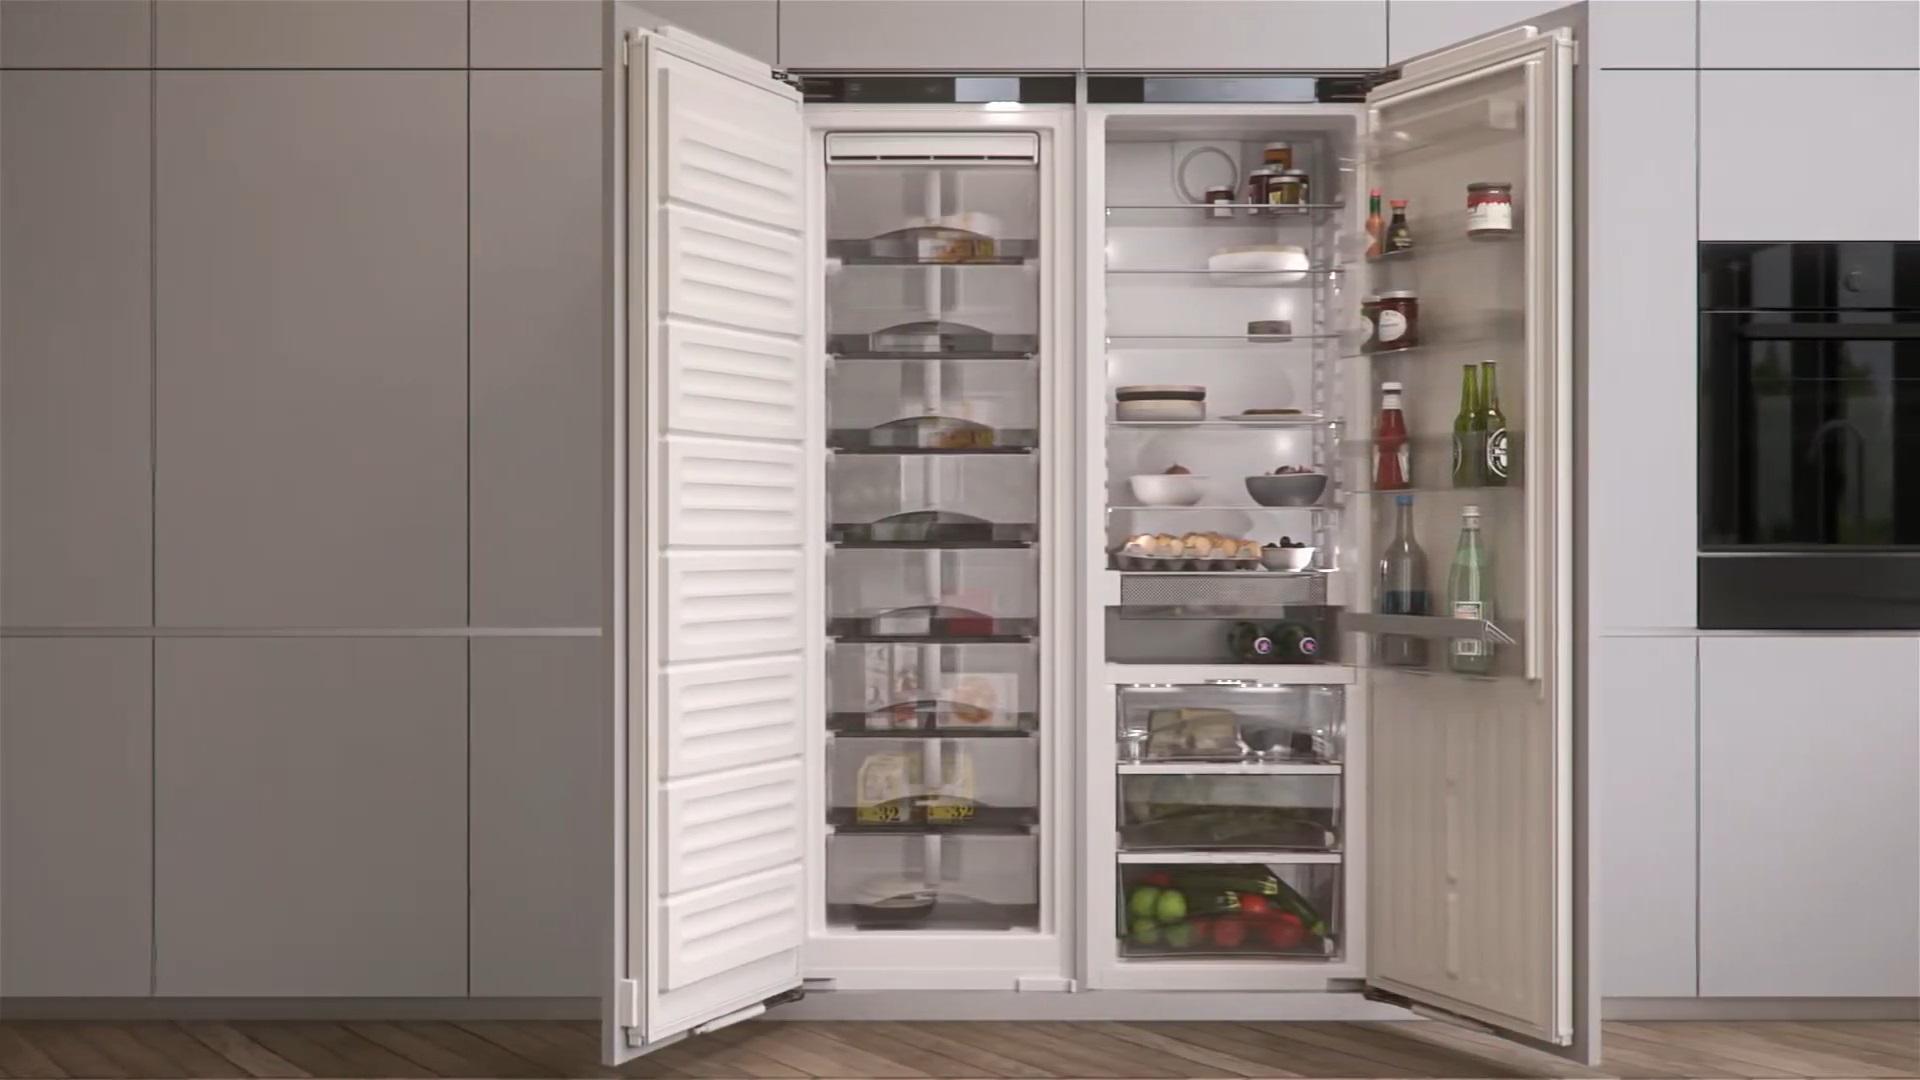 Jumbo T Refrigerator